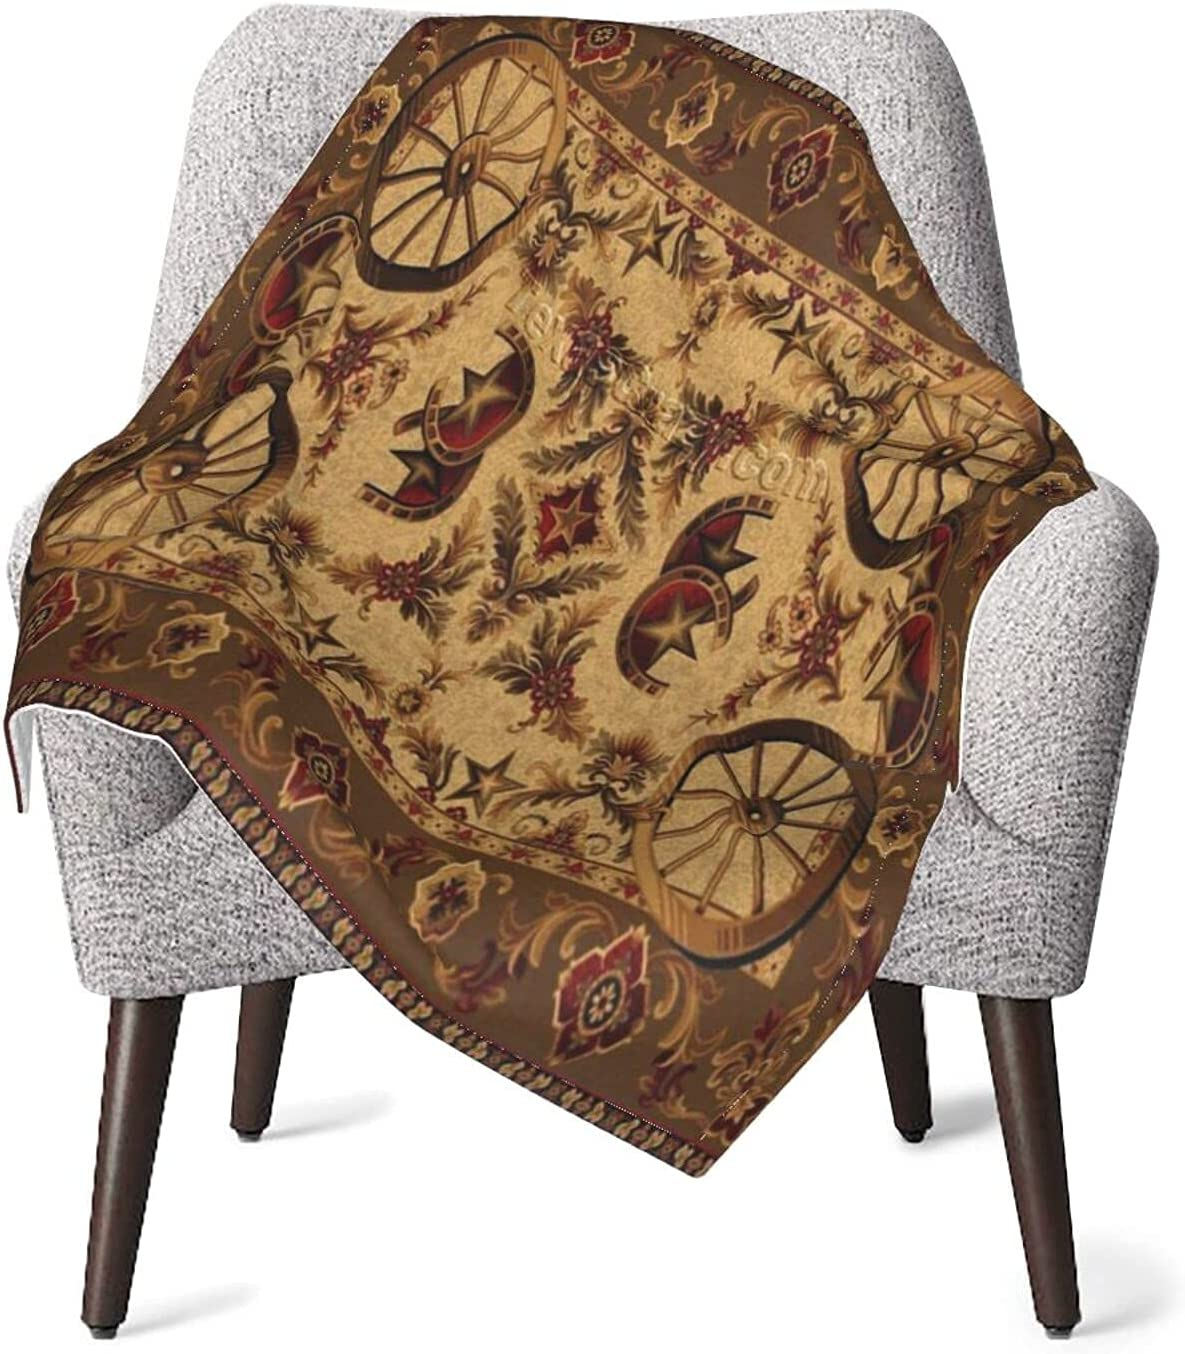 Retro Beige Western Max 79% OFF Wagon Wheel Art Cozy Blankets Air Throw Warm Limited Special Price